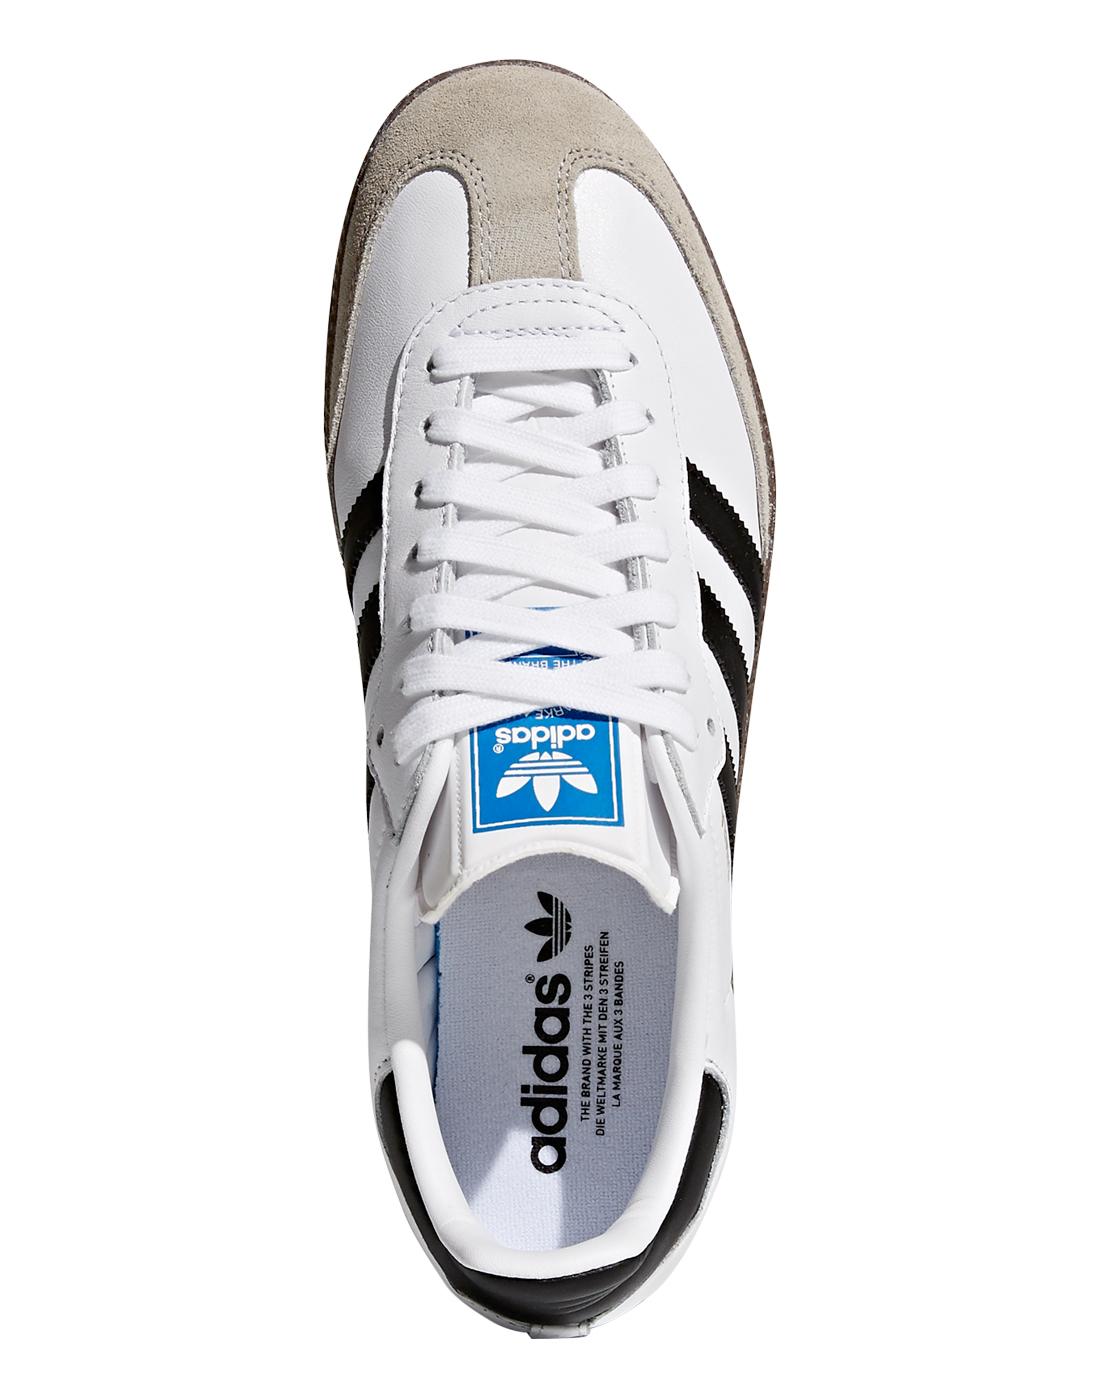 9847115ce Men's adidas Originals Samba OG | White | Life Style Sports